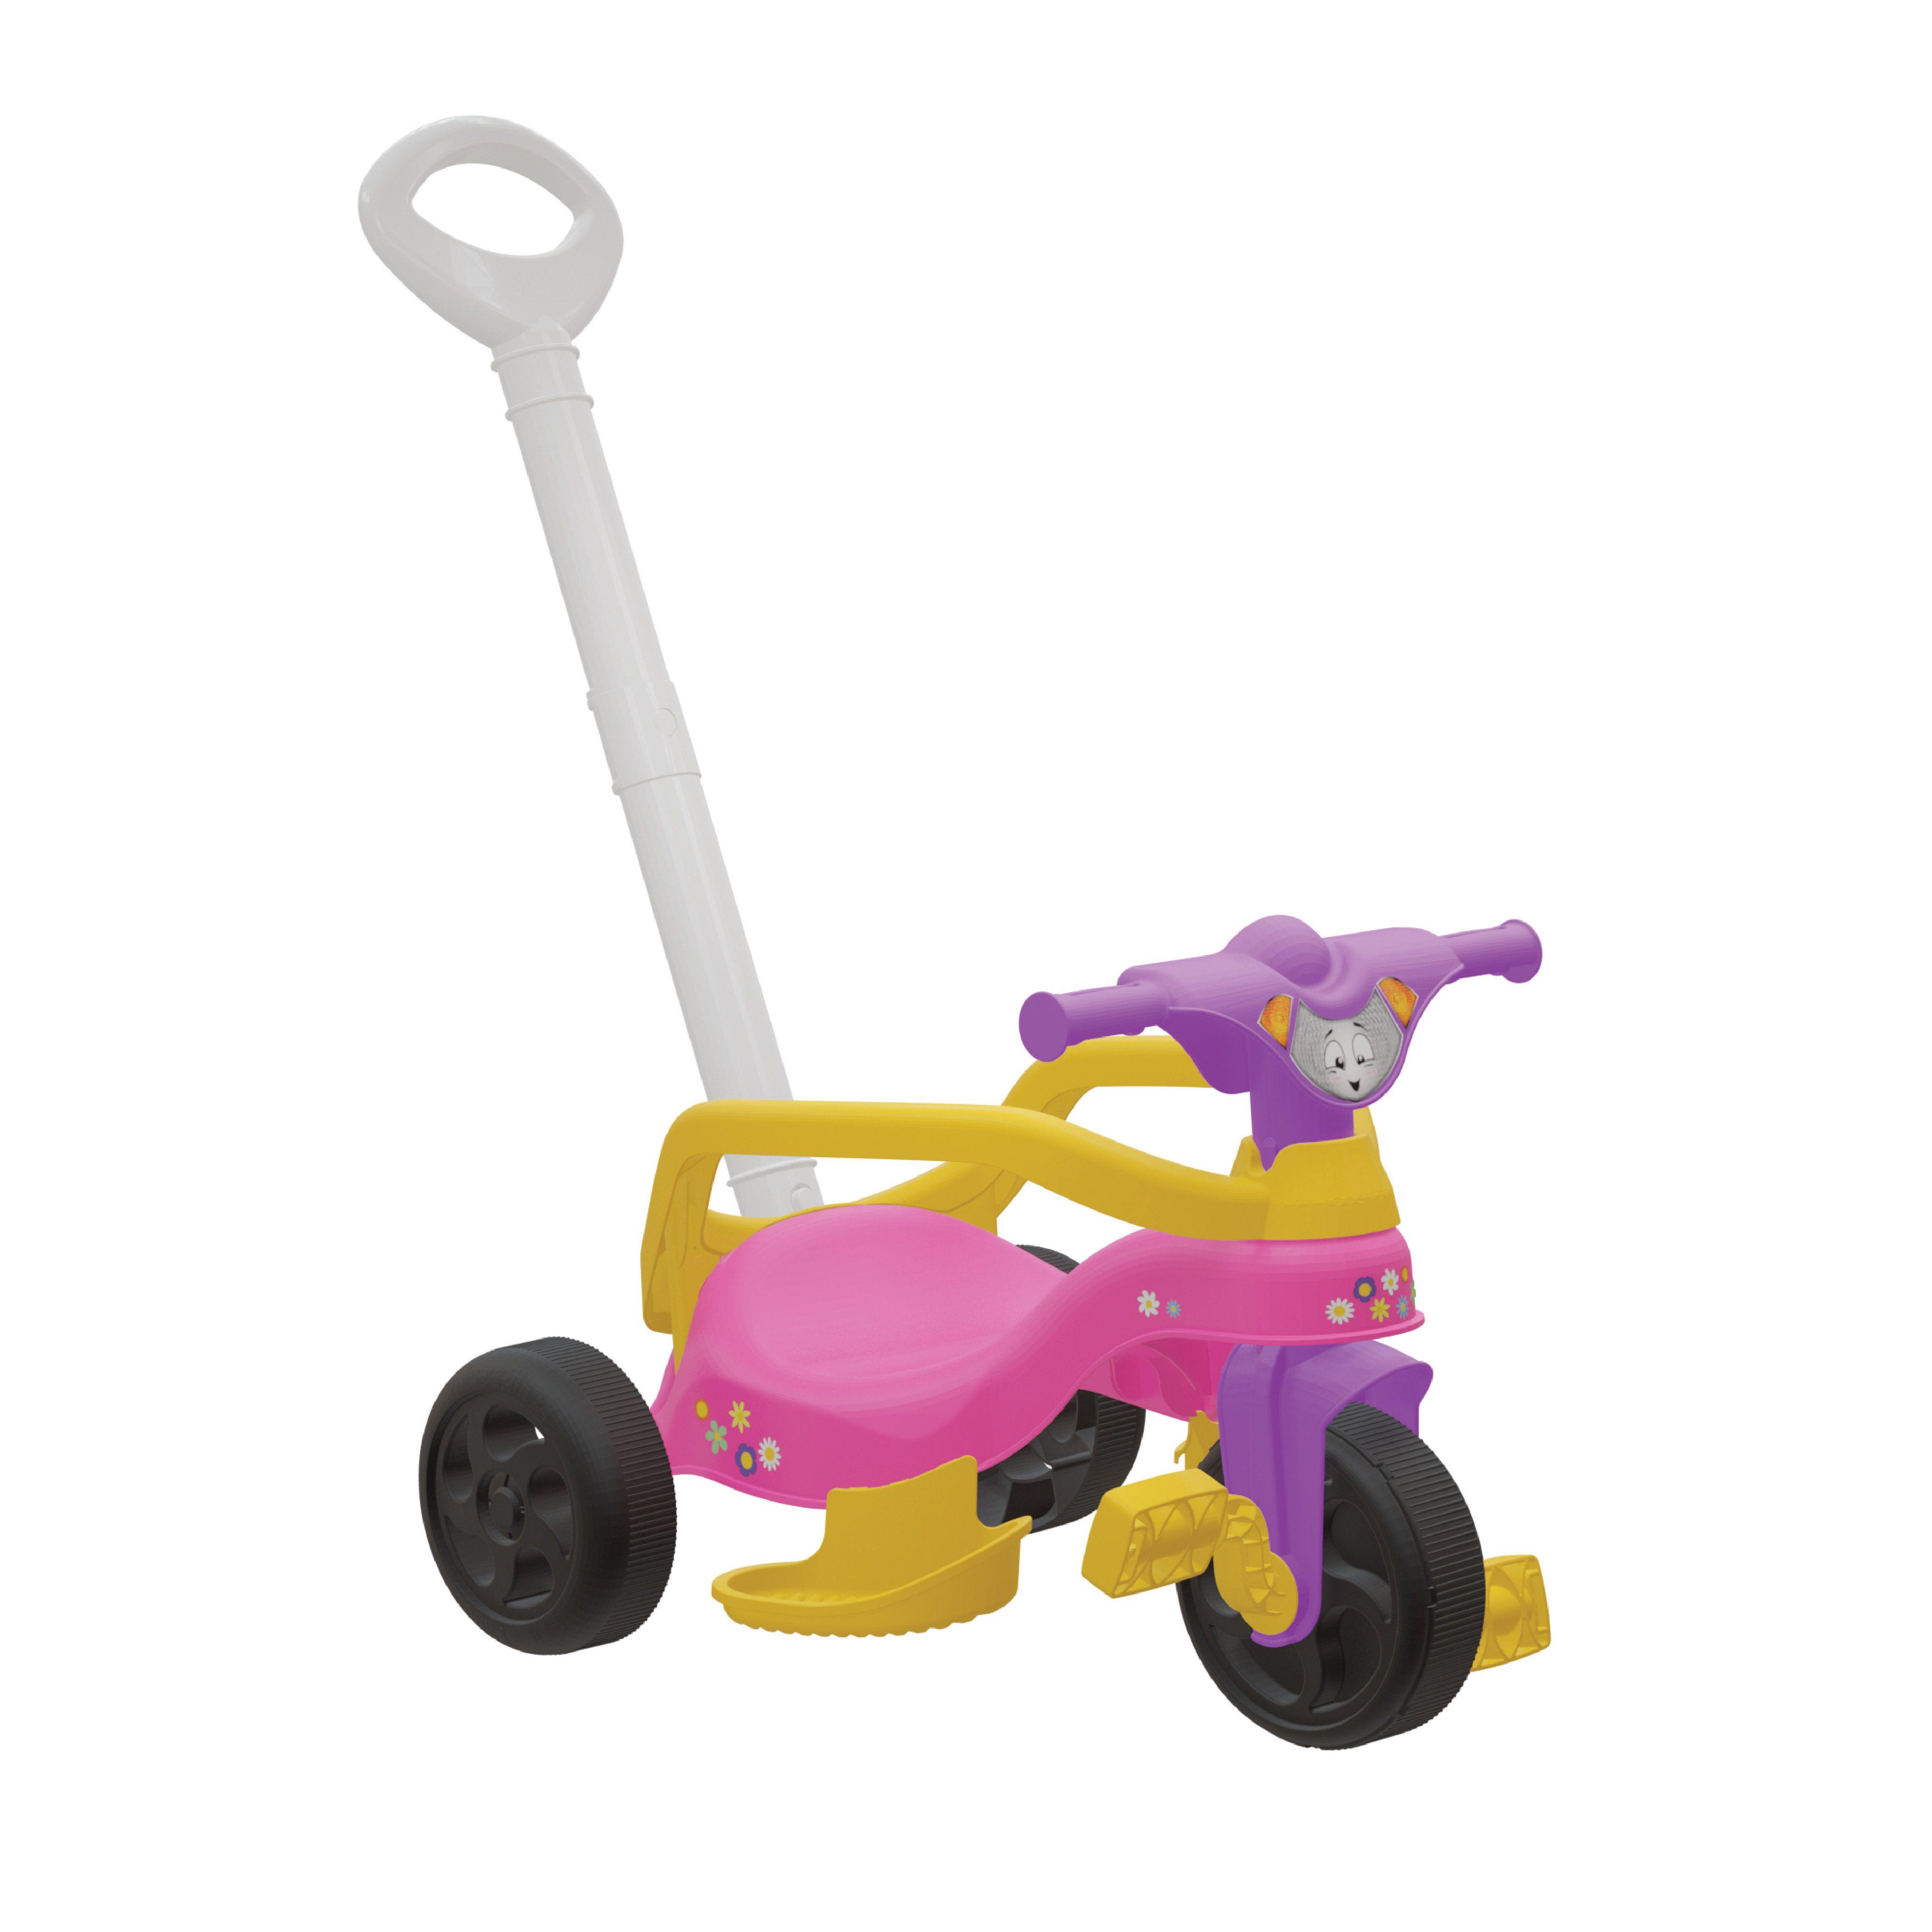 Triciclo Encantado Completo-790352